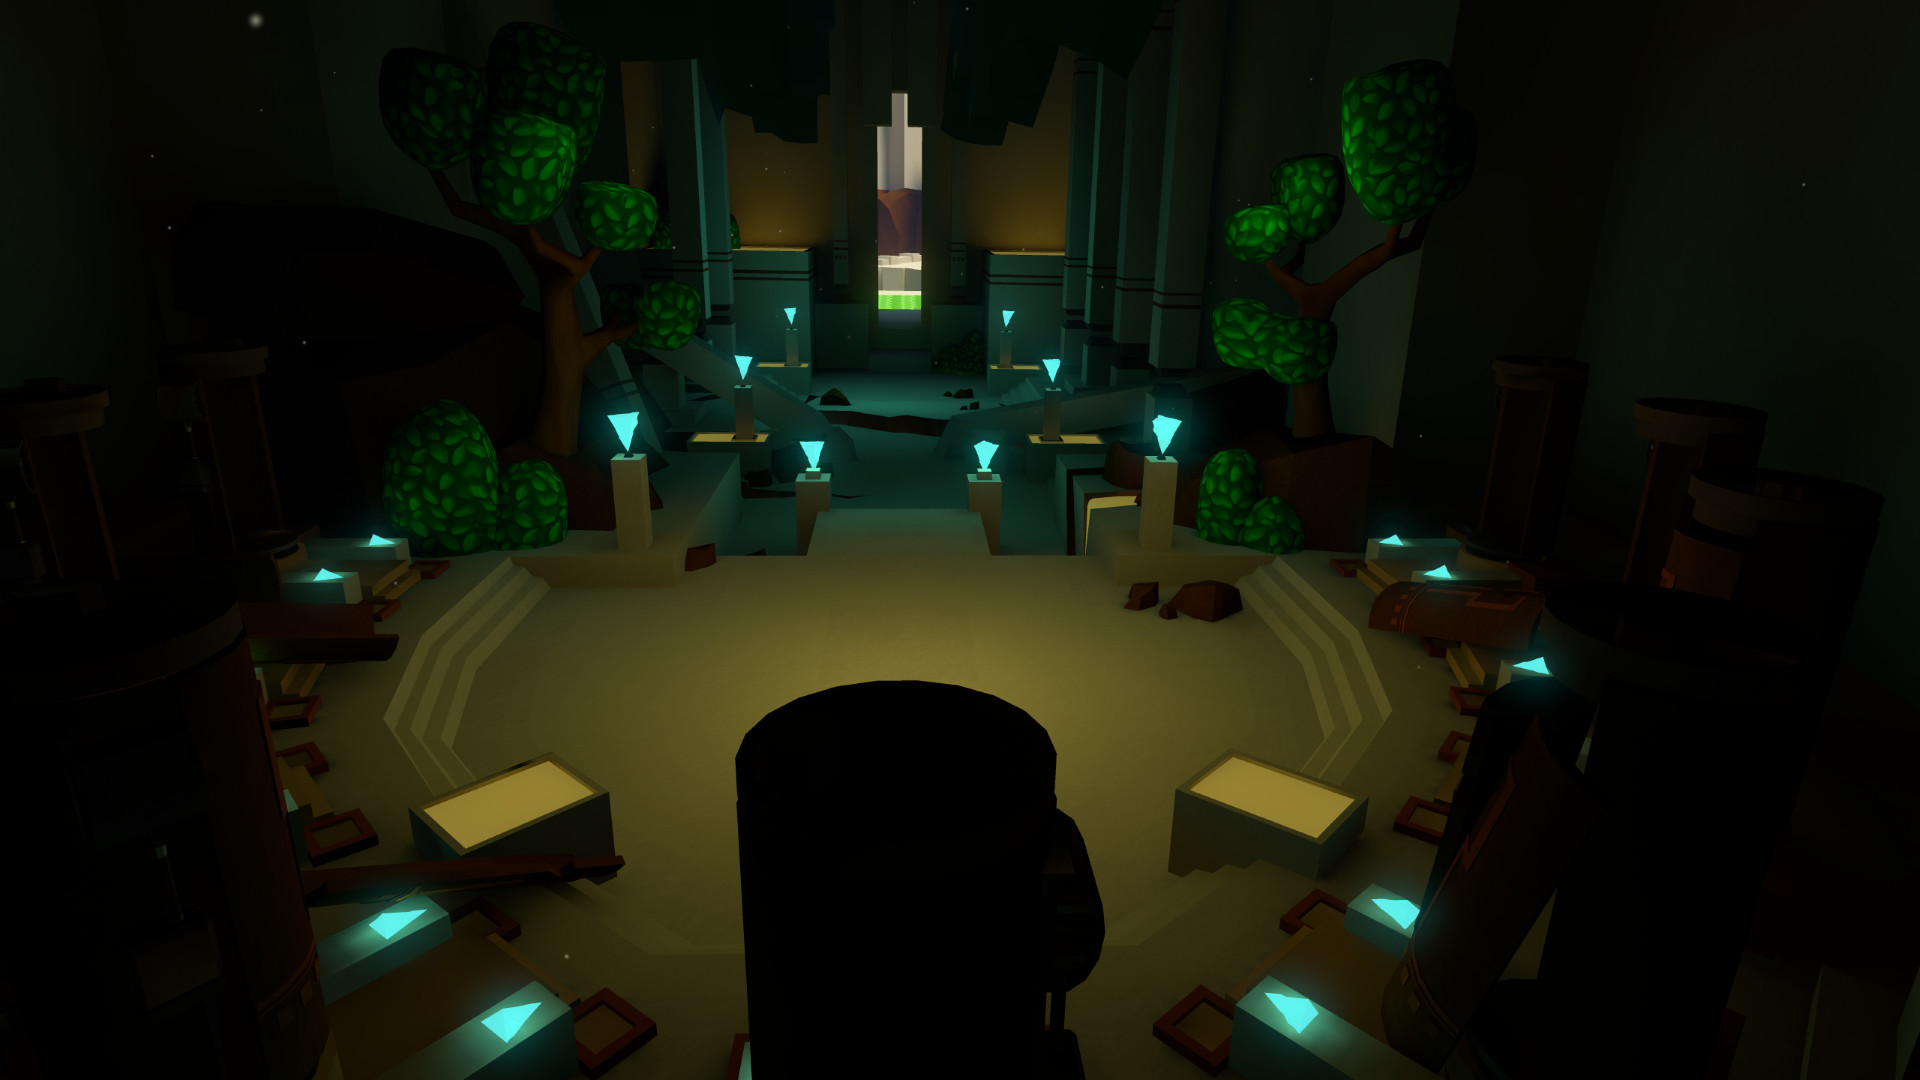 Oculus Quest 游戏《Windlands VR》御风飞行插图(1)